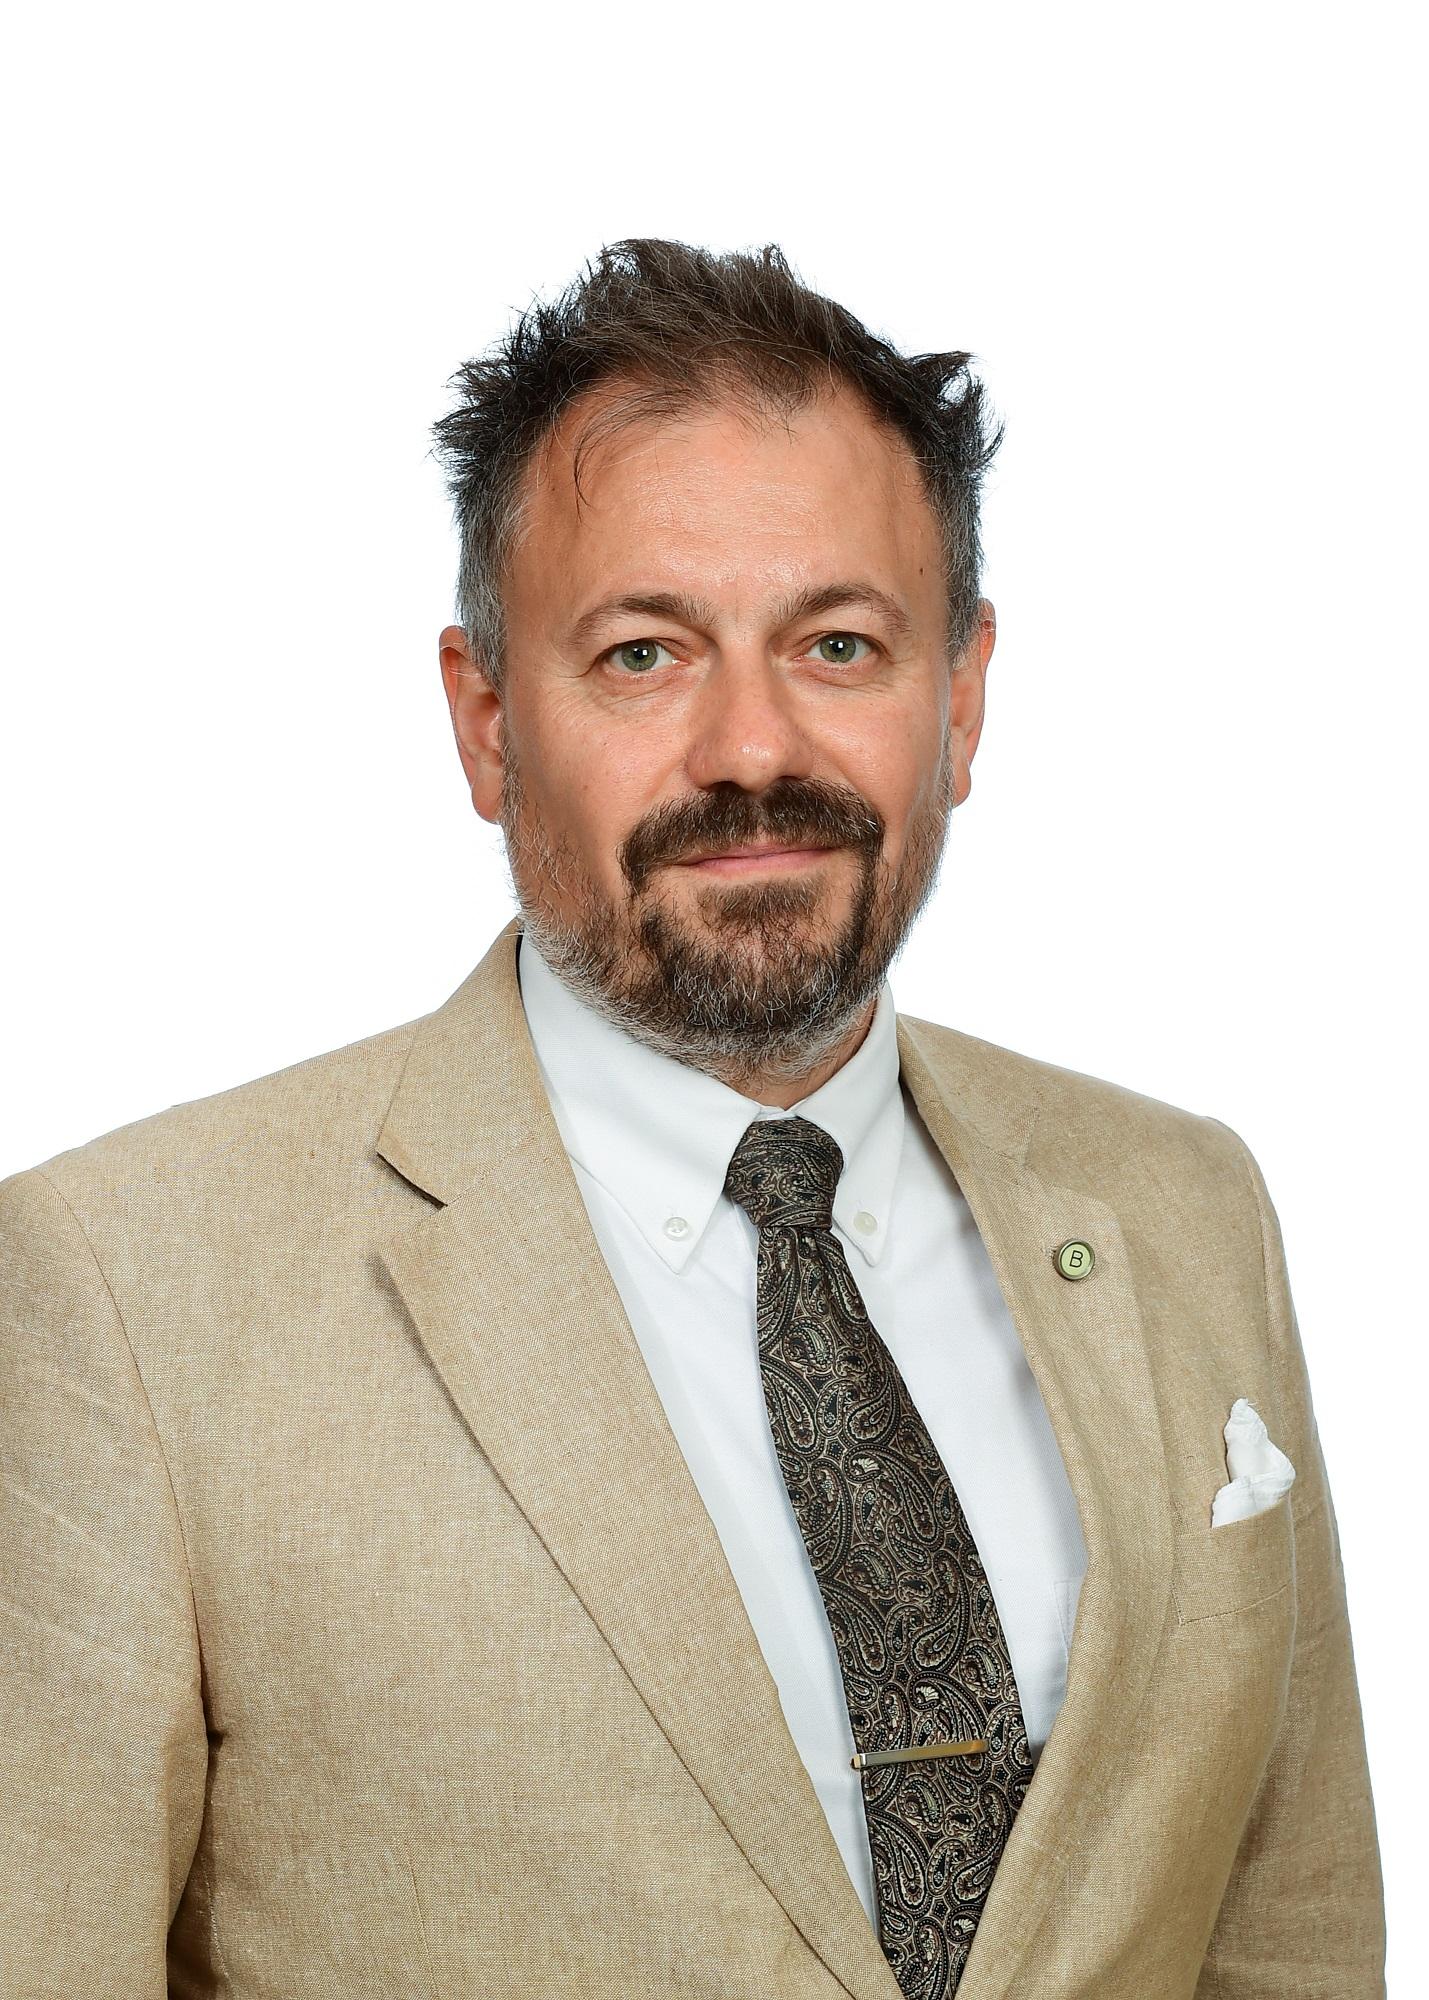 Theodore Bohn